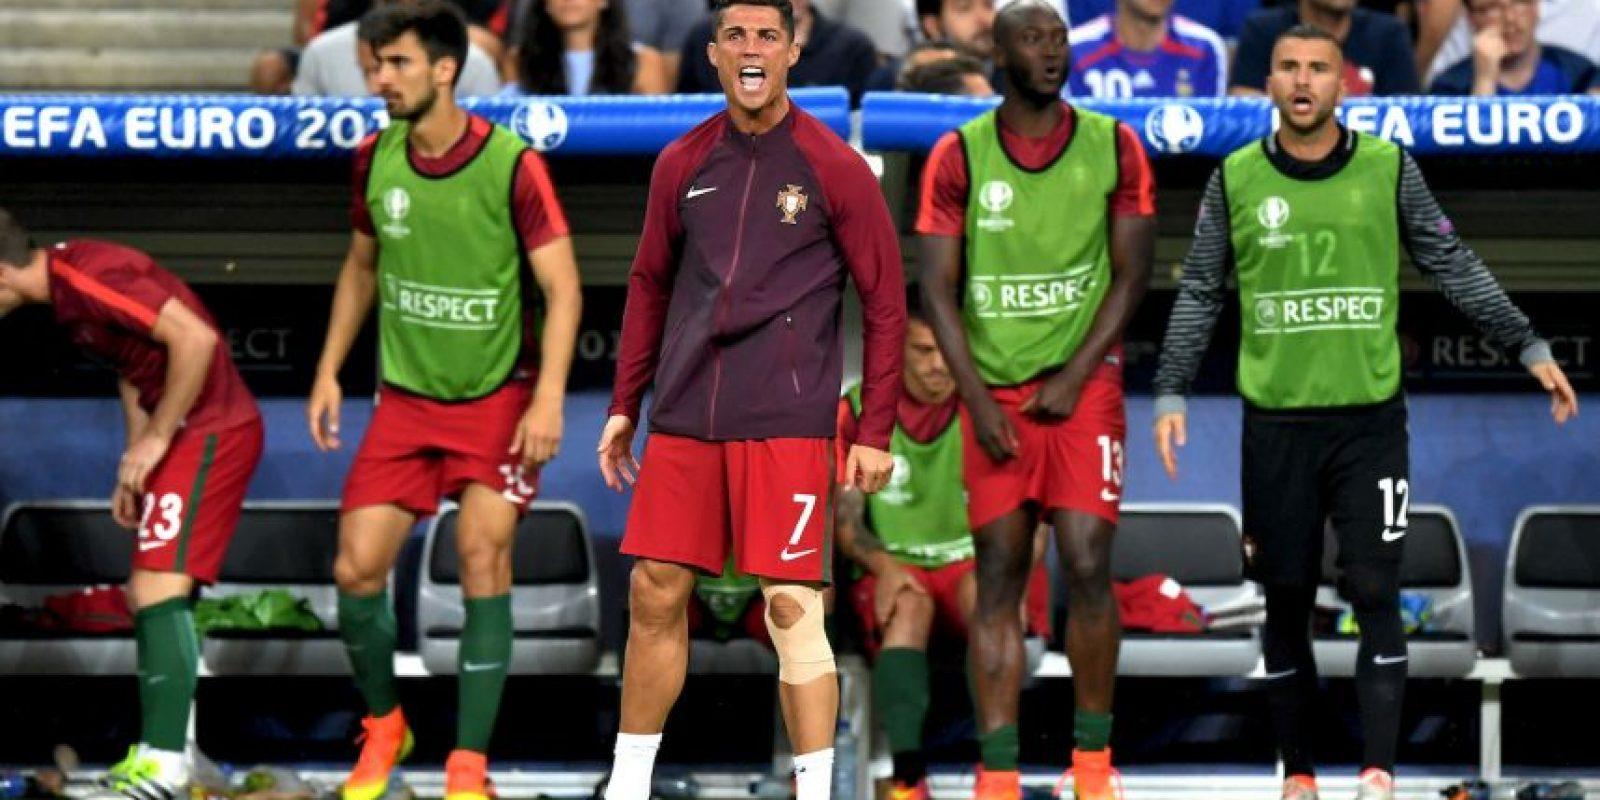 Así vivió Cristiano Ronaldo la final de la Euro 2016 Foto:Getty Images. Imagen Por: